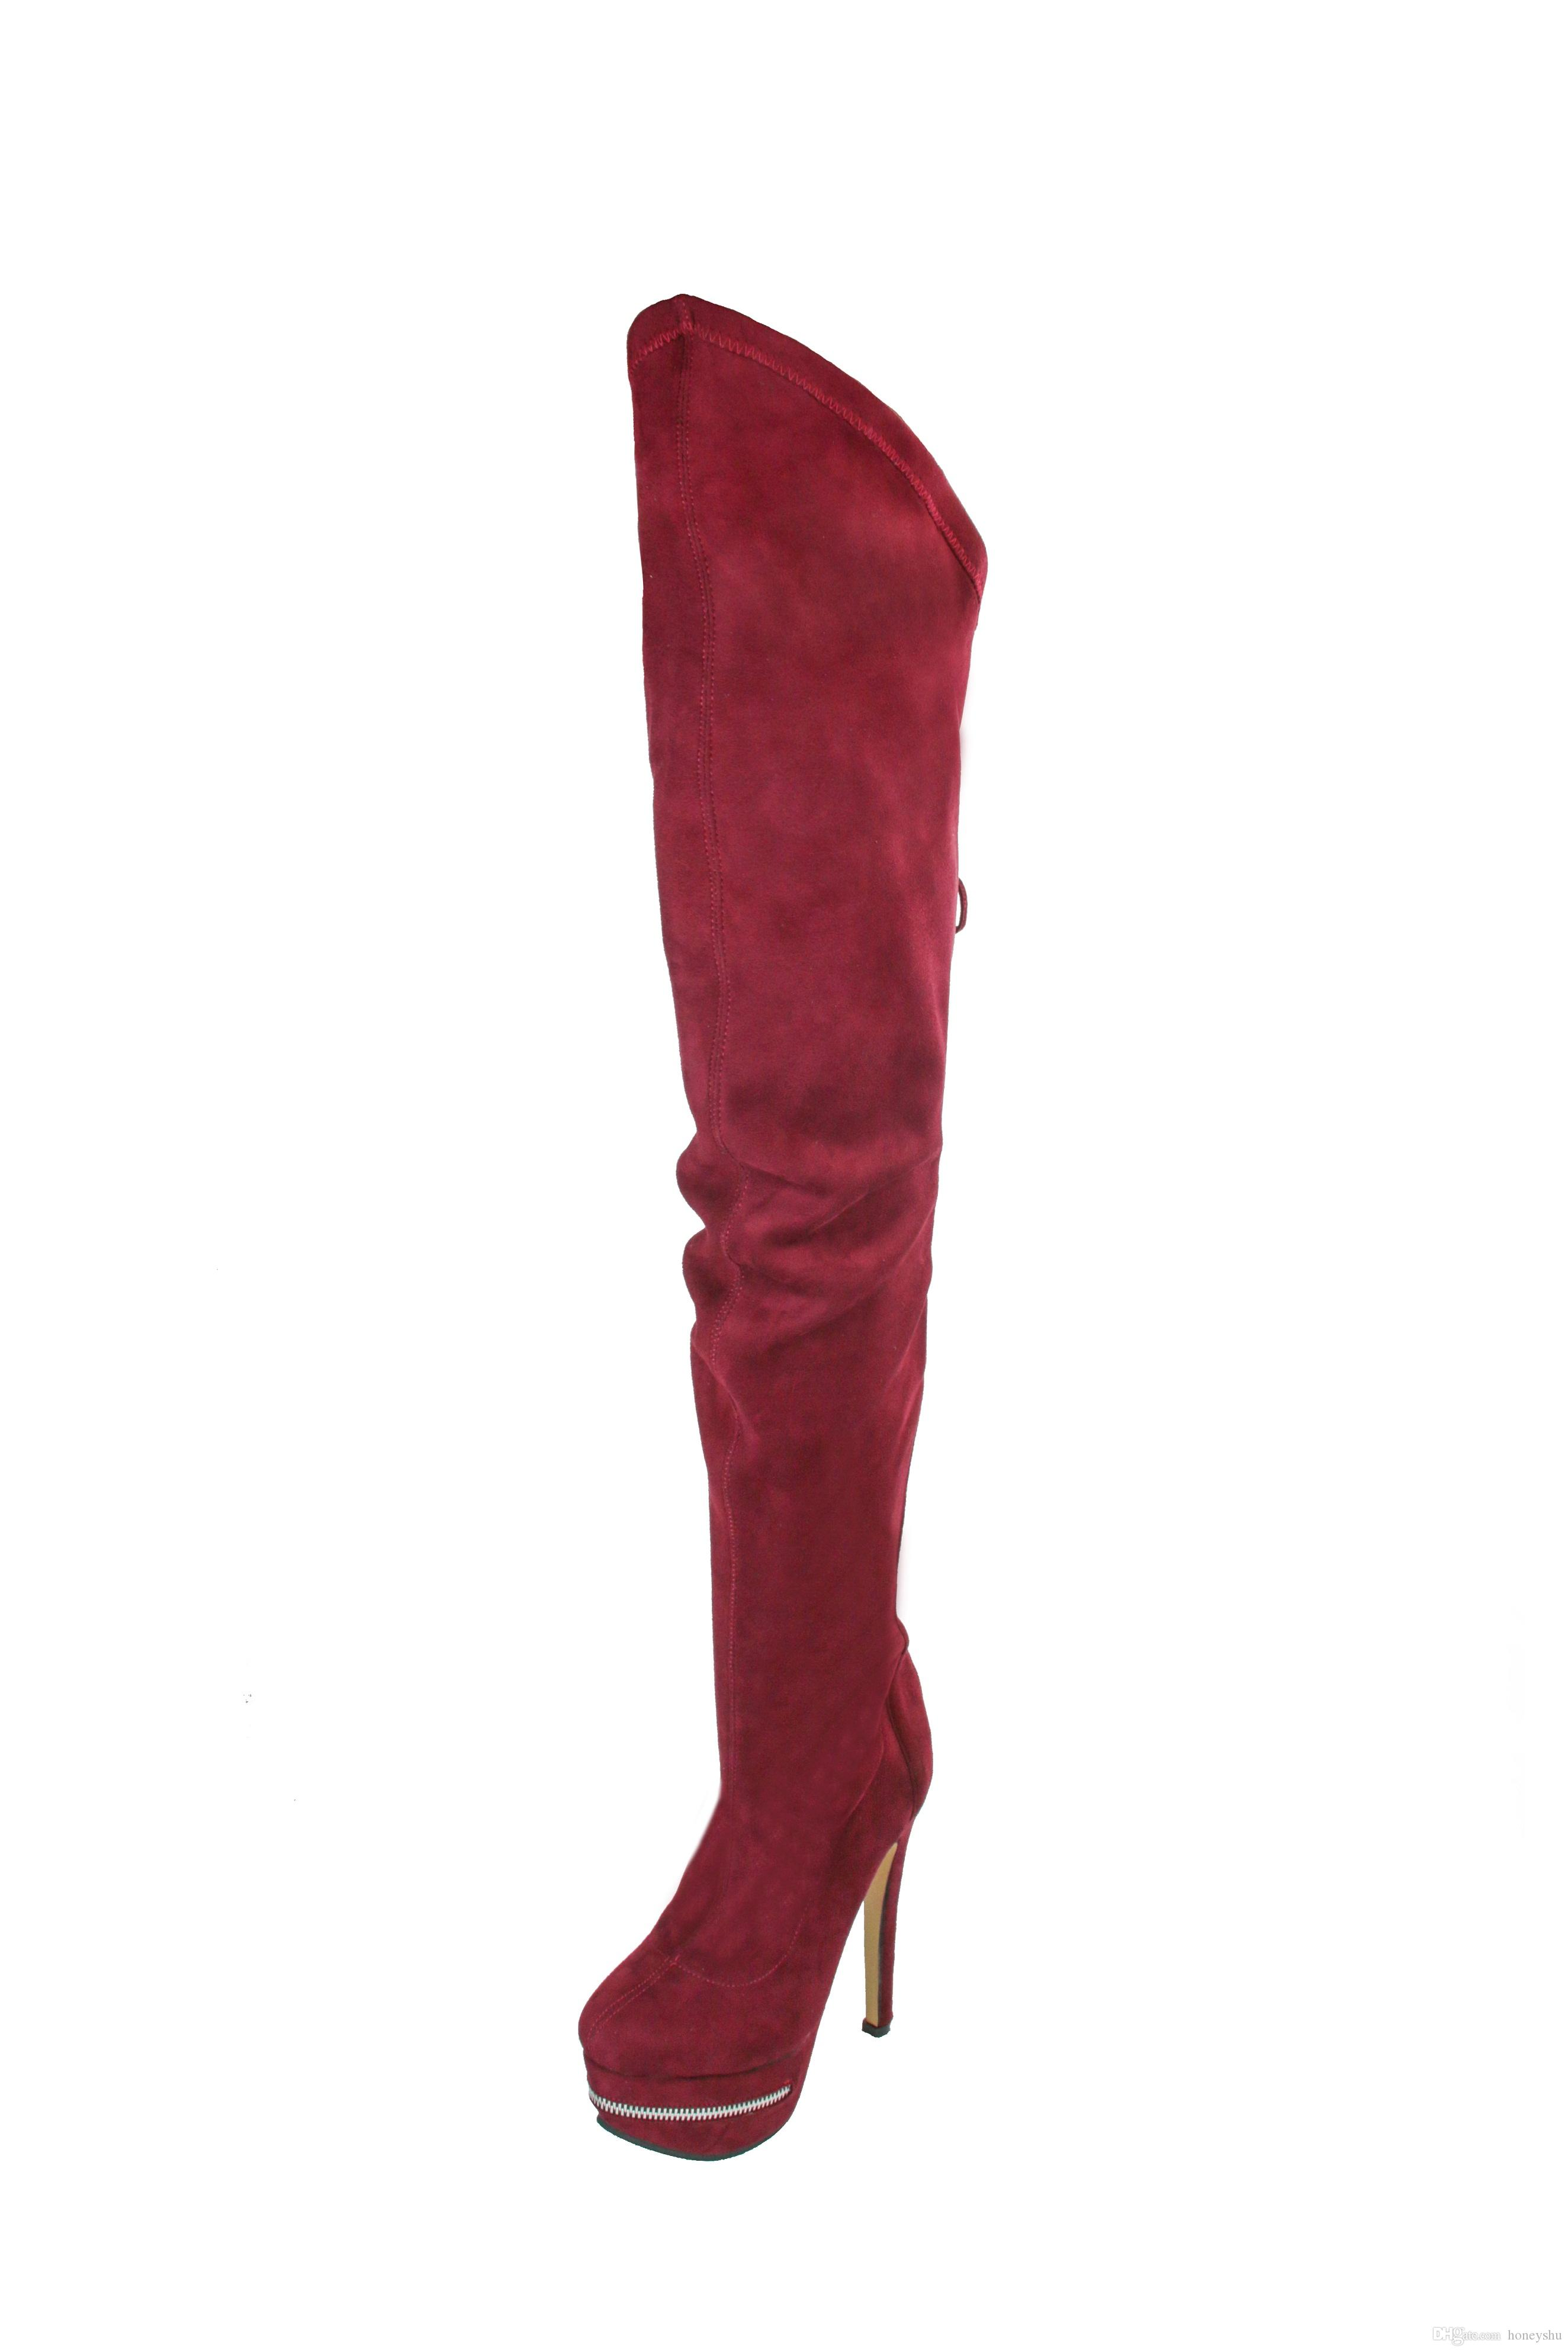 Kolnoo Womens Handmade High Heel Knee Boots Platform Ziper Closure Lace-up Deco Winter Fashion Booty Shoes XD331